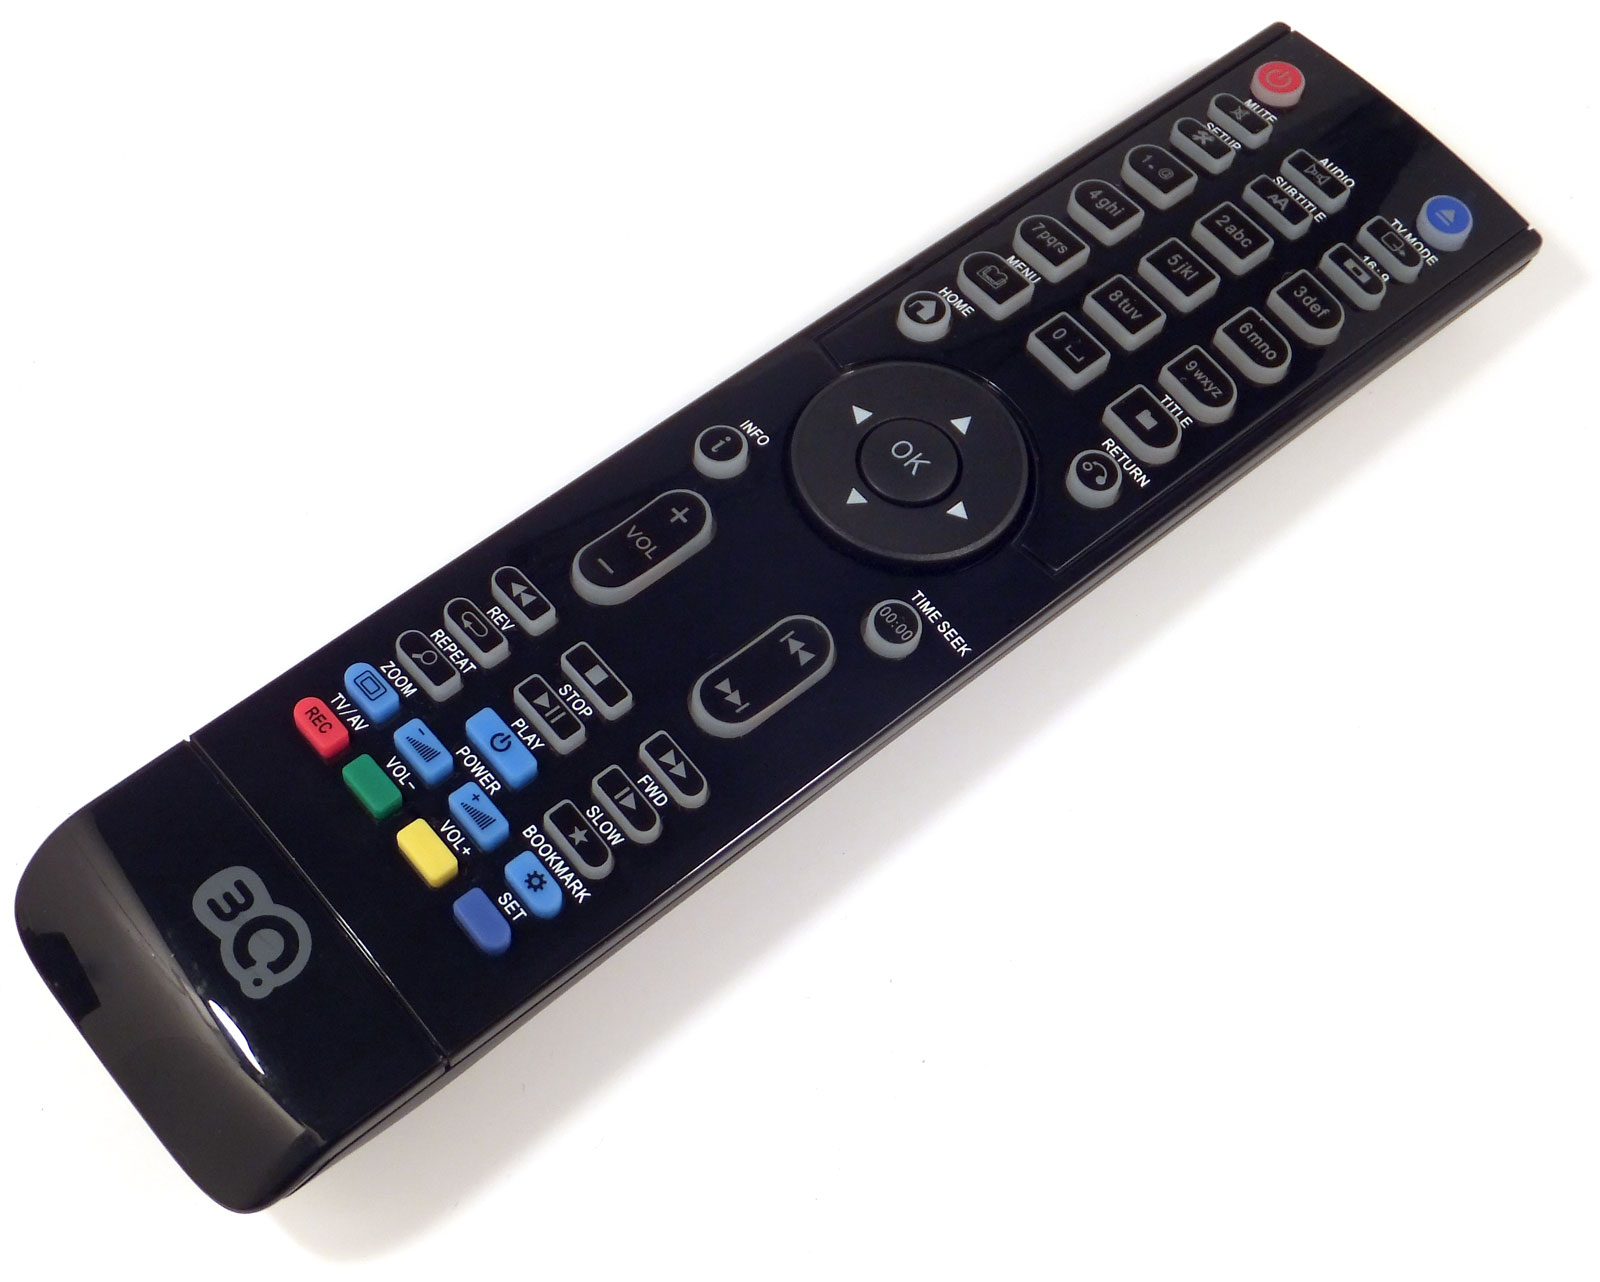 Ремонт пульта от телевизора в домашних условиях